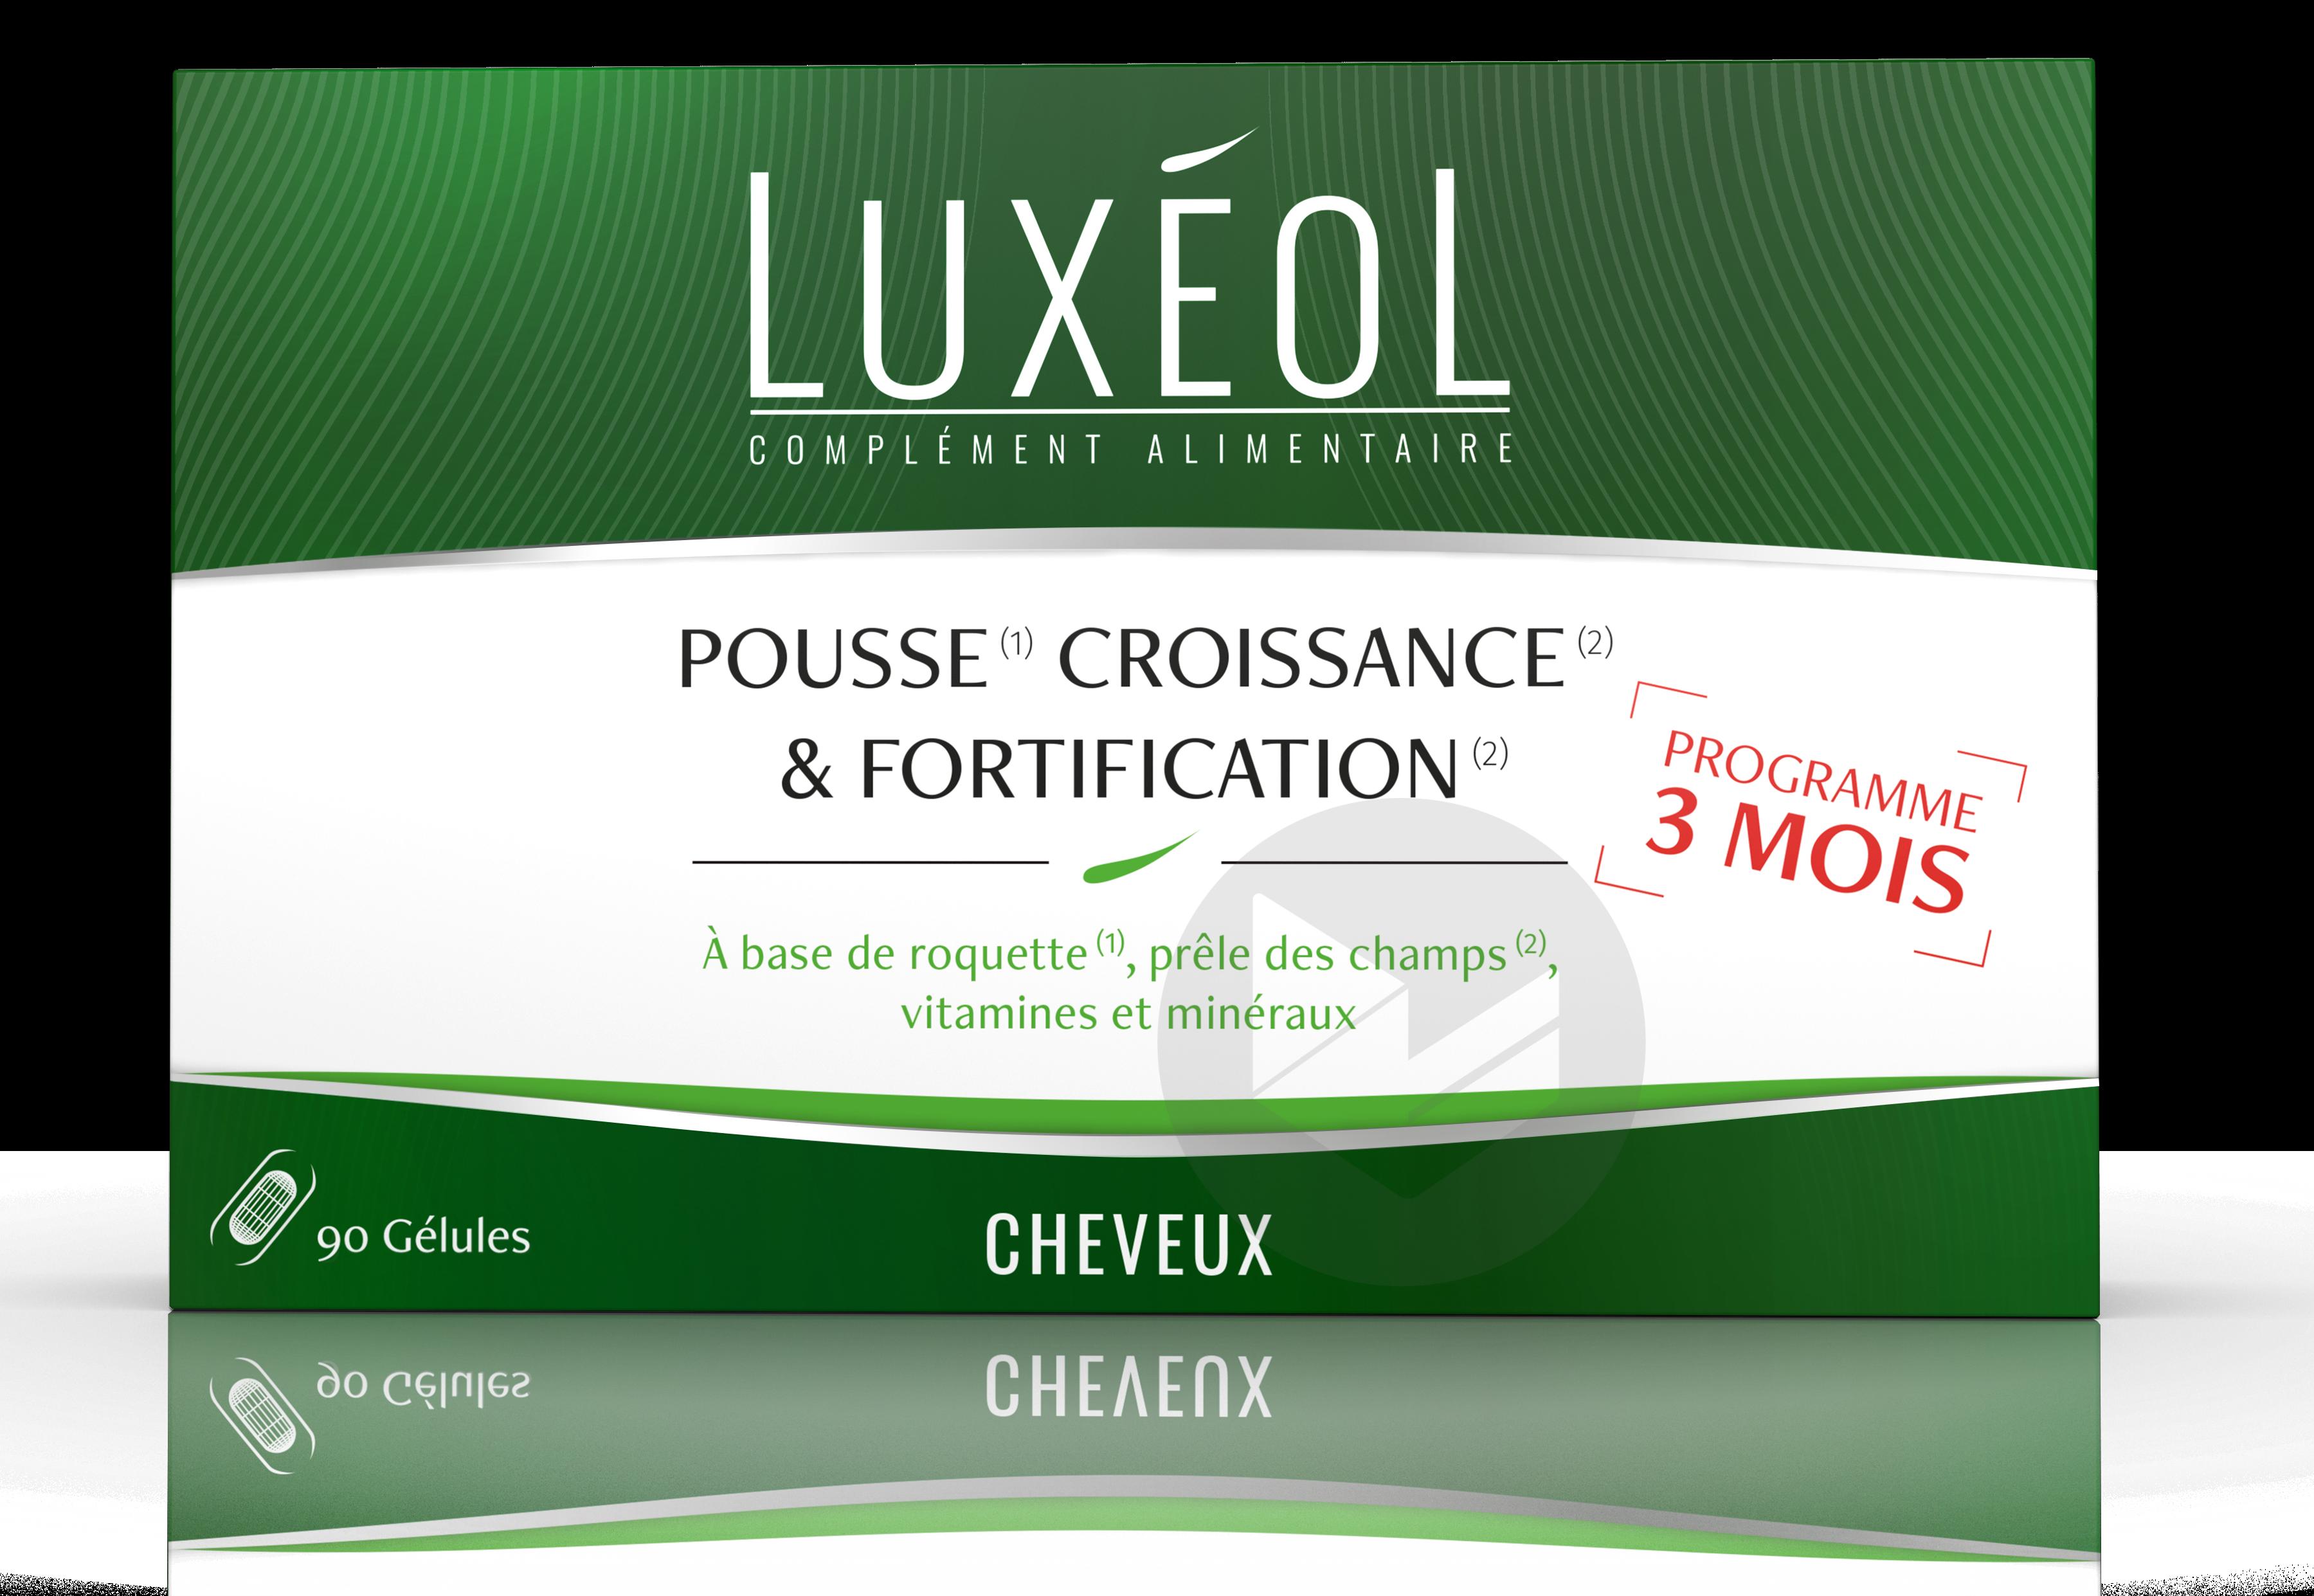 Luxeol Pousse Croissance Fortification 3 Mois